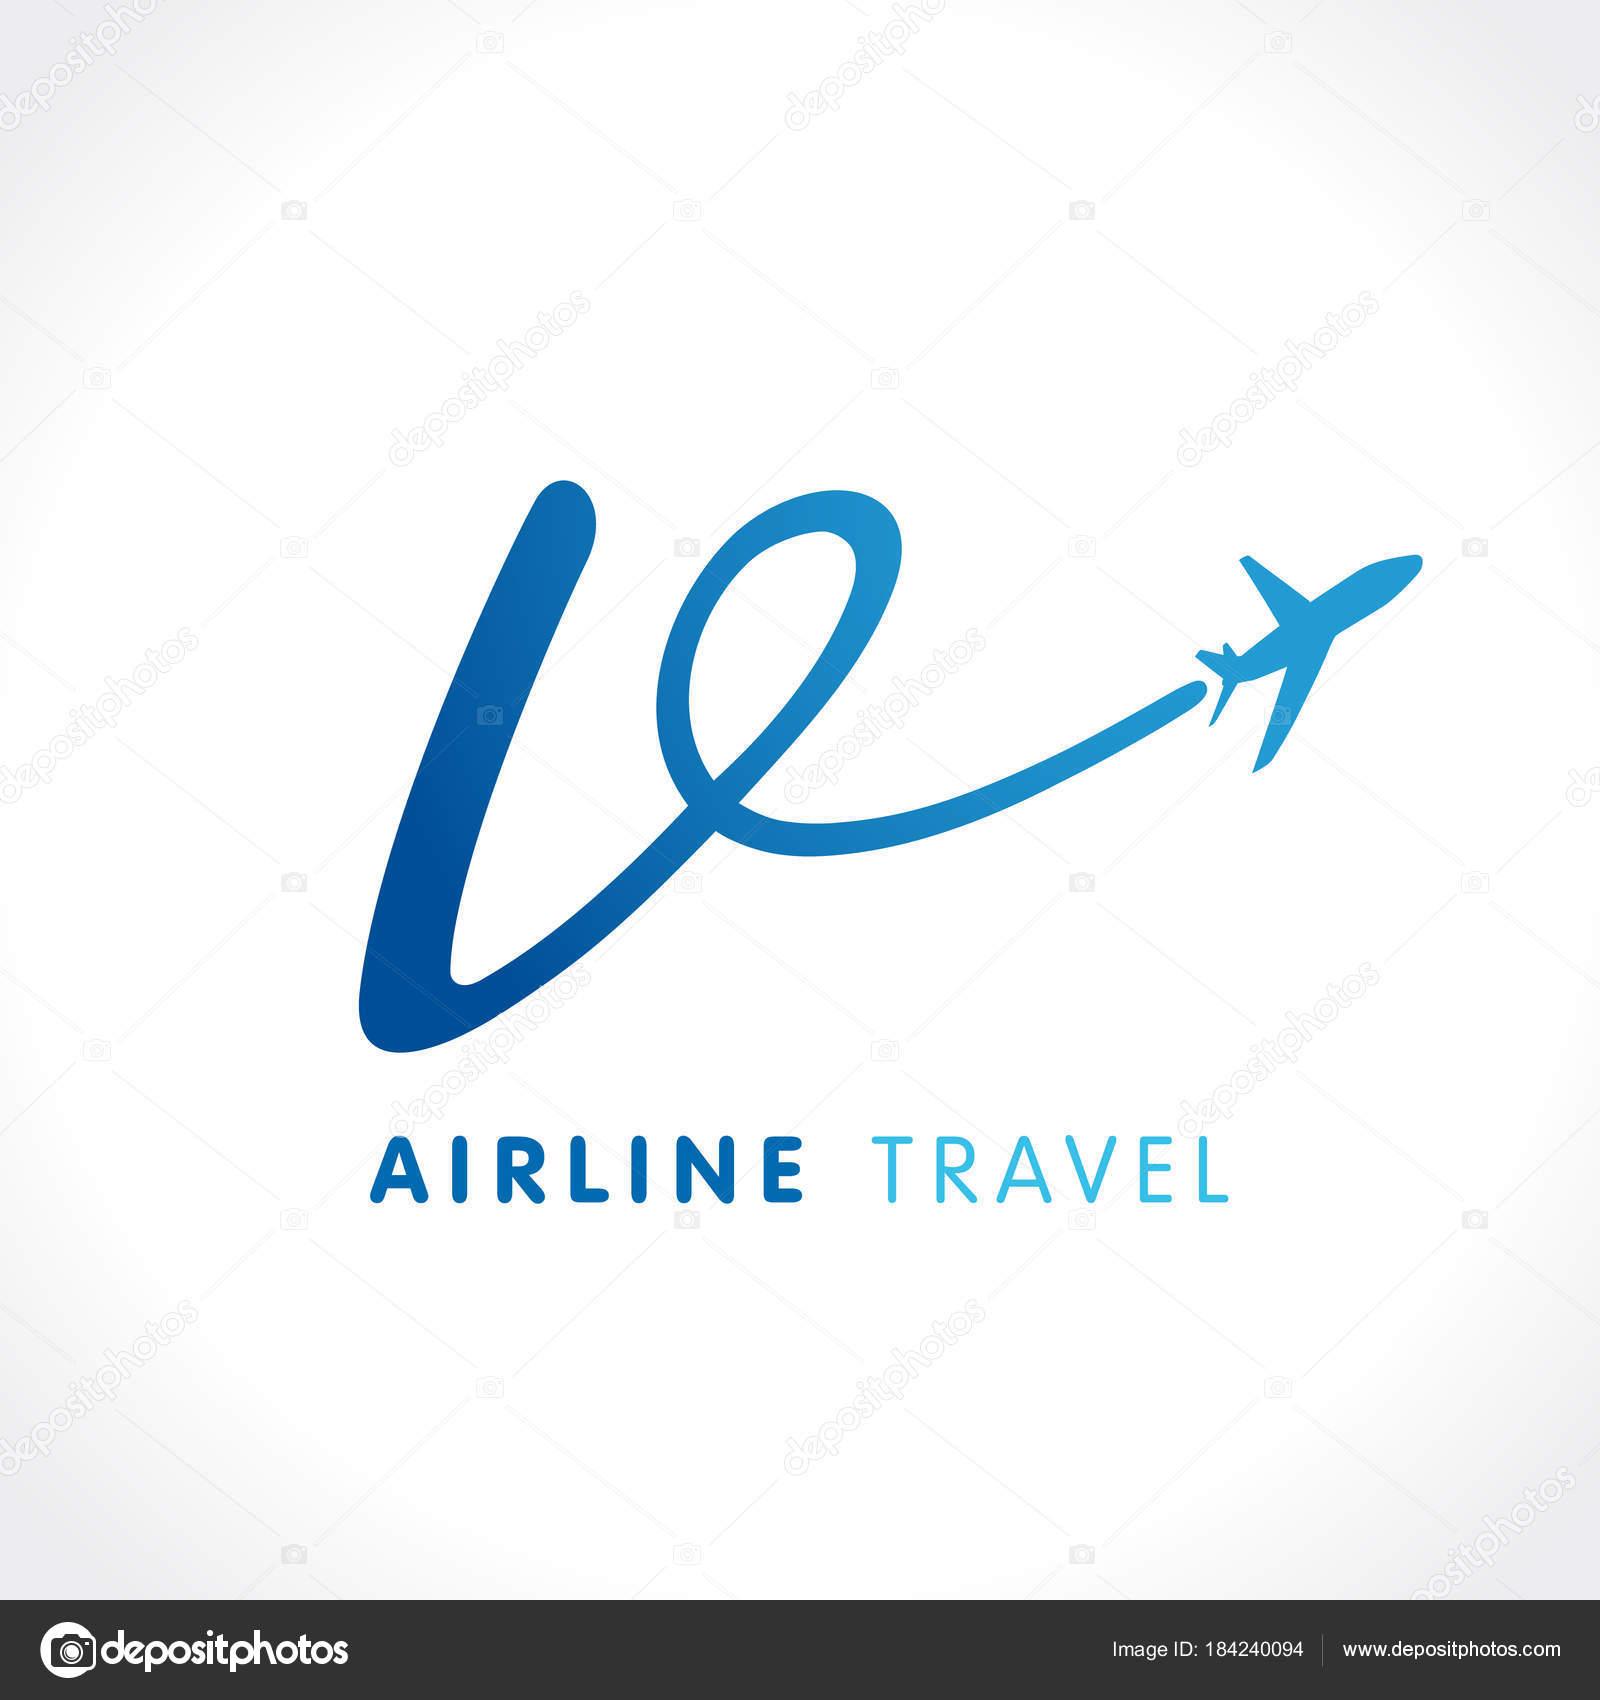 Letter Transport Travel Company Logo Airline Business Travel